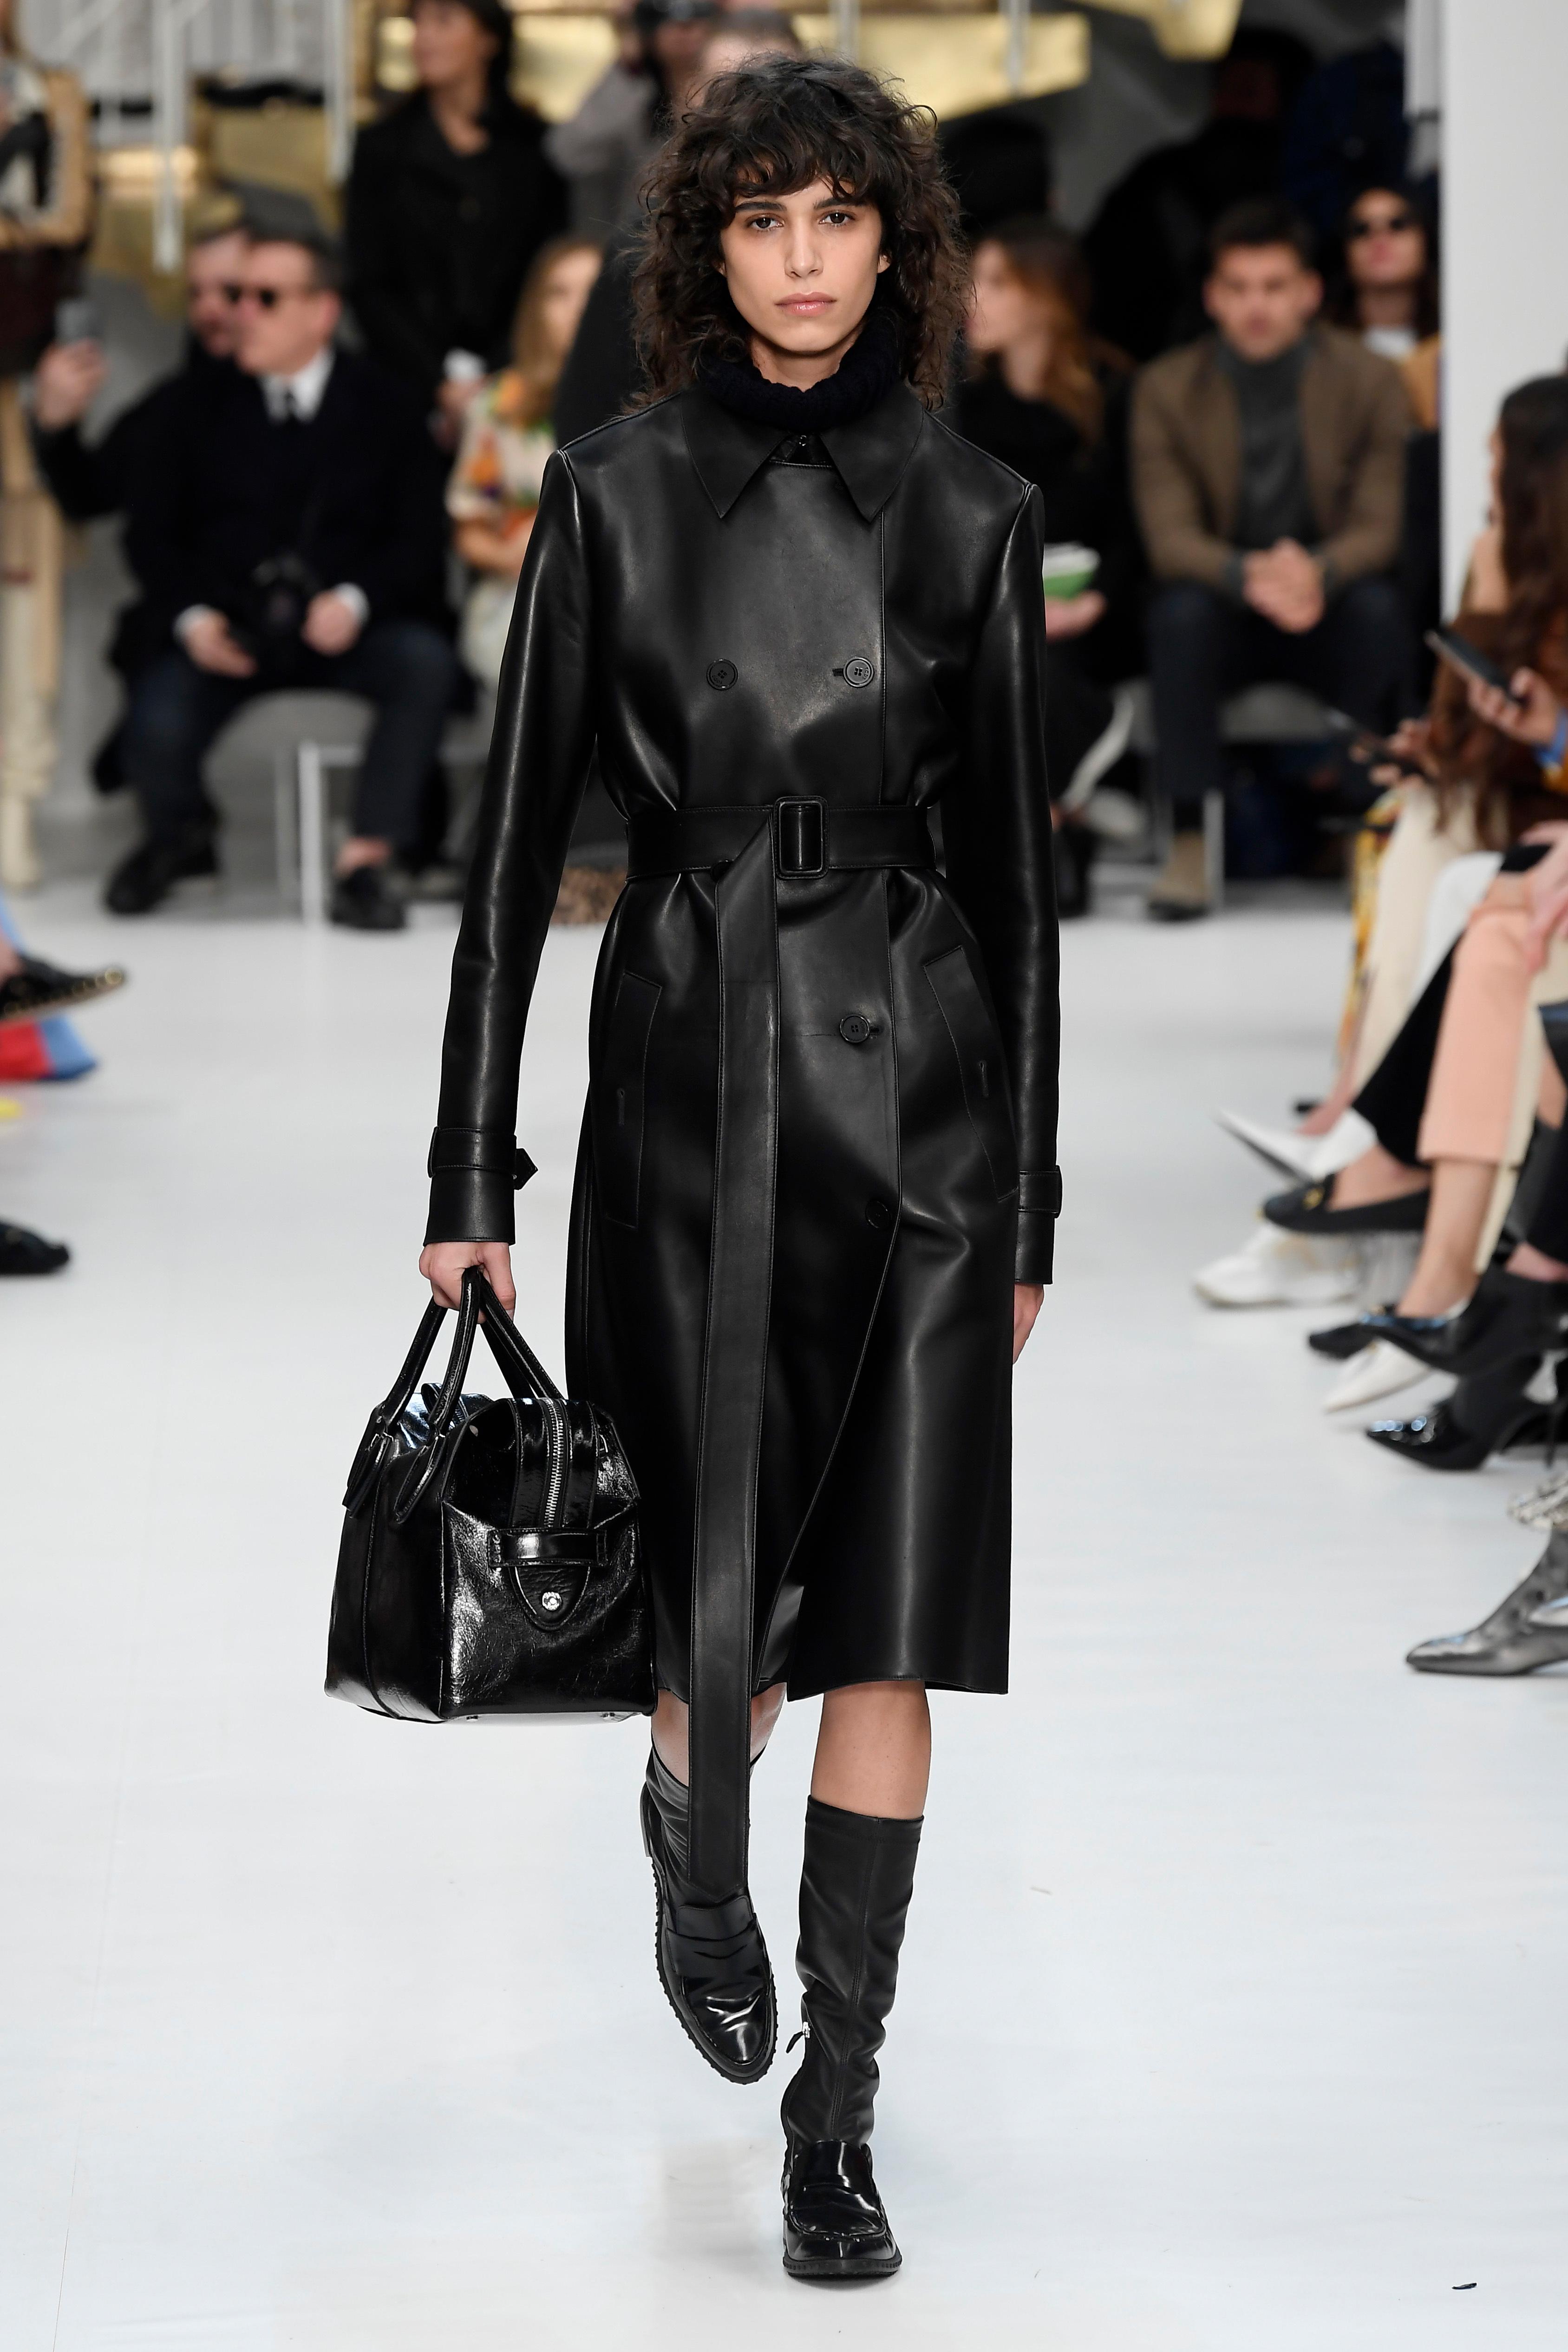 Model on the catwalkTod's show, Runway, Fall Winter 2019, Milan Fashion Week, Italy - 22 Feb 2019